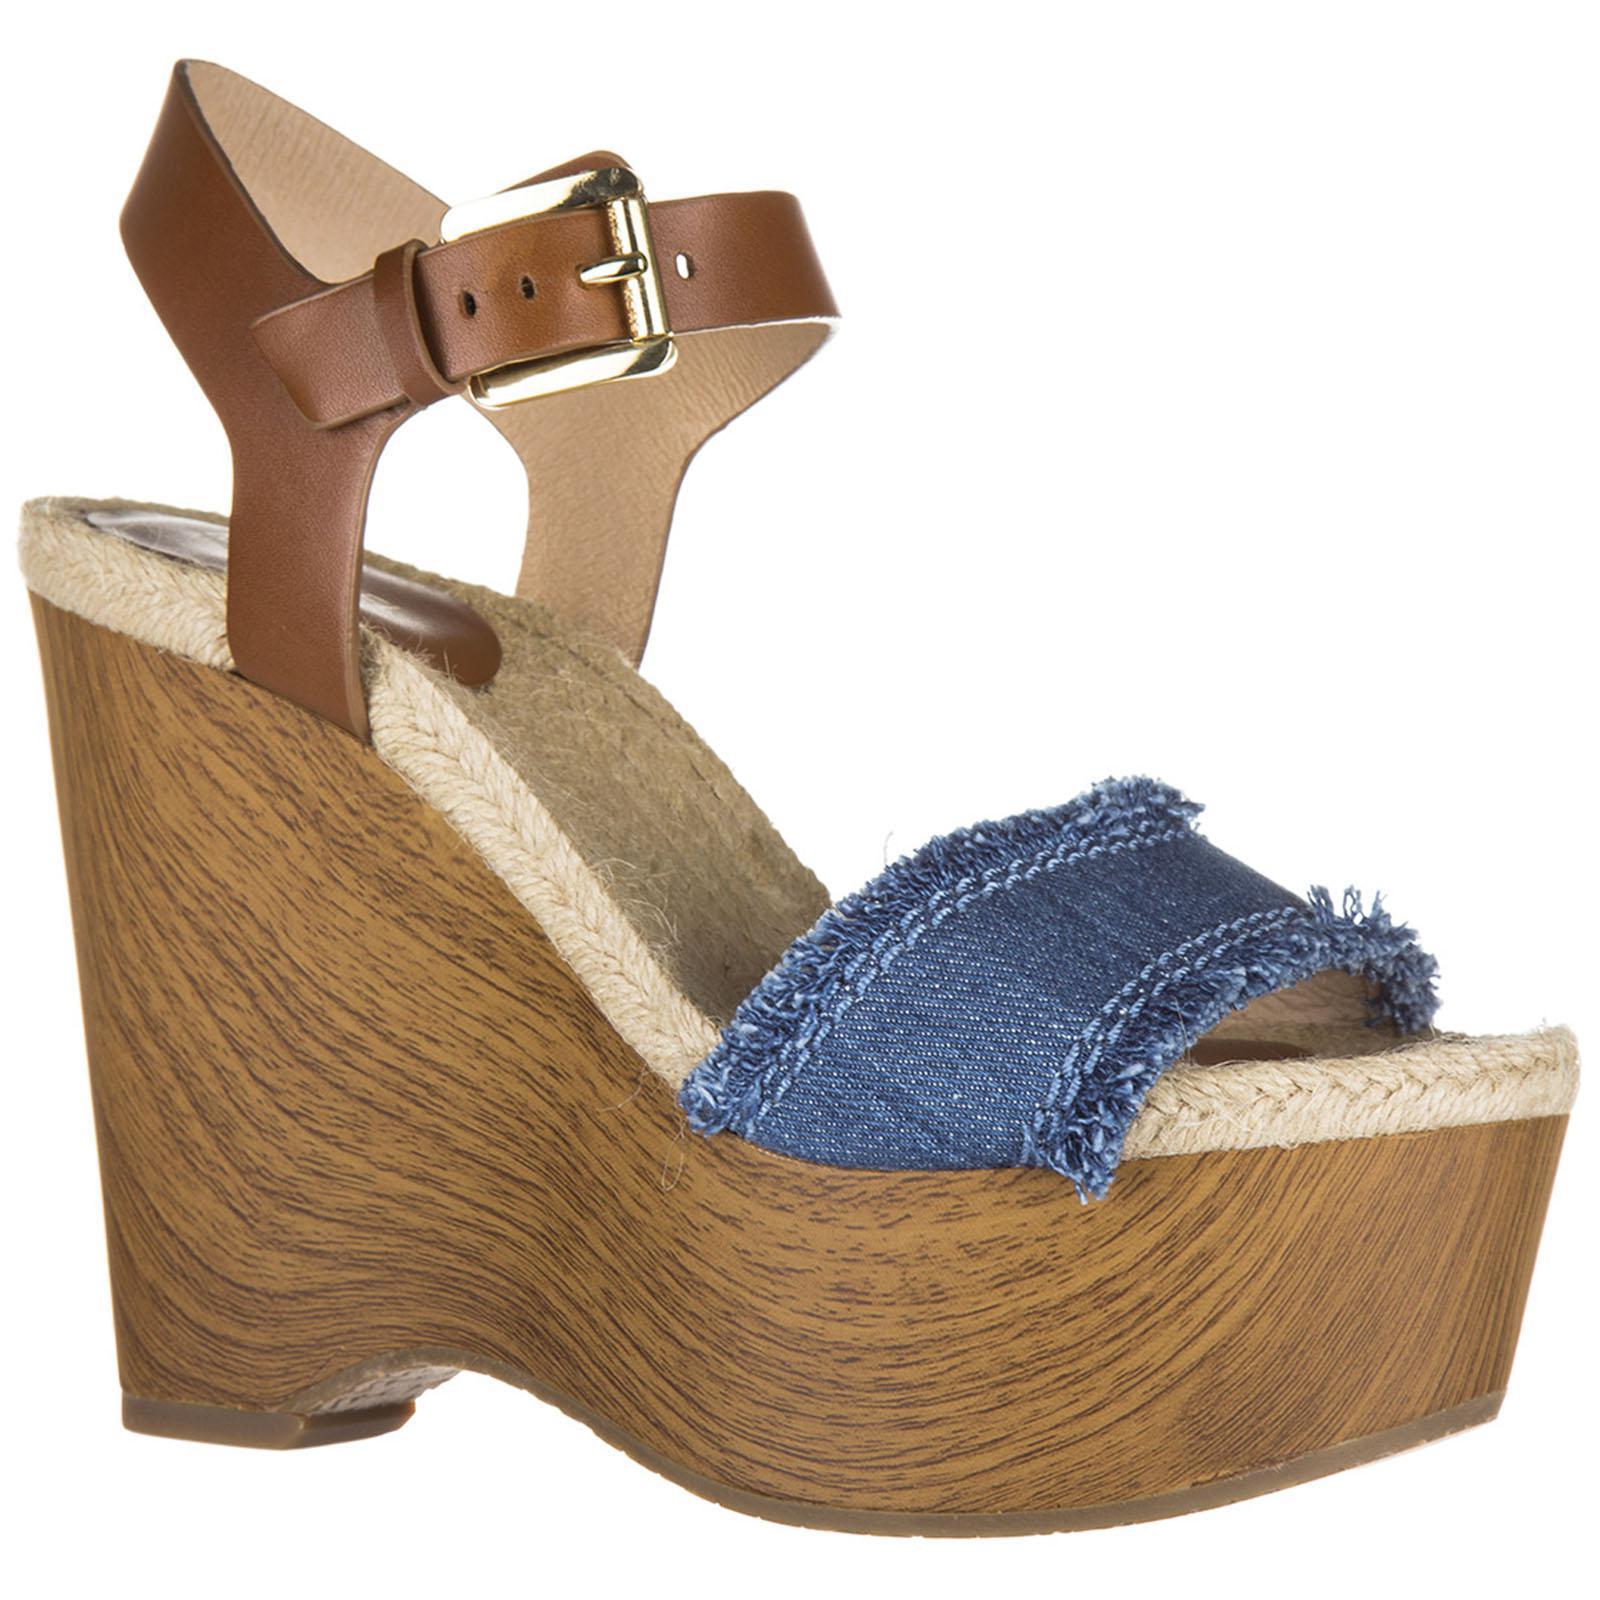 bfbf8faf31a Michael Kors - Blue Leather Shoes Wedges Sandals Leni - Lyst. View  fullscreen